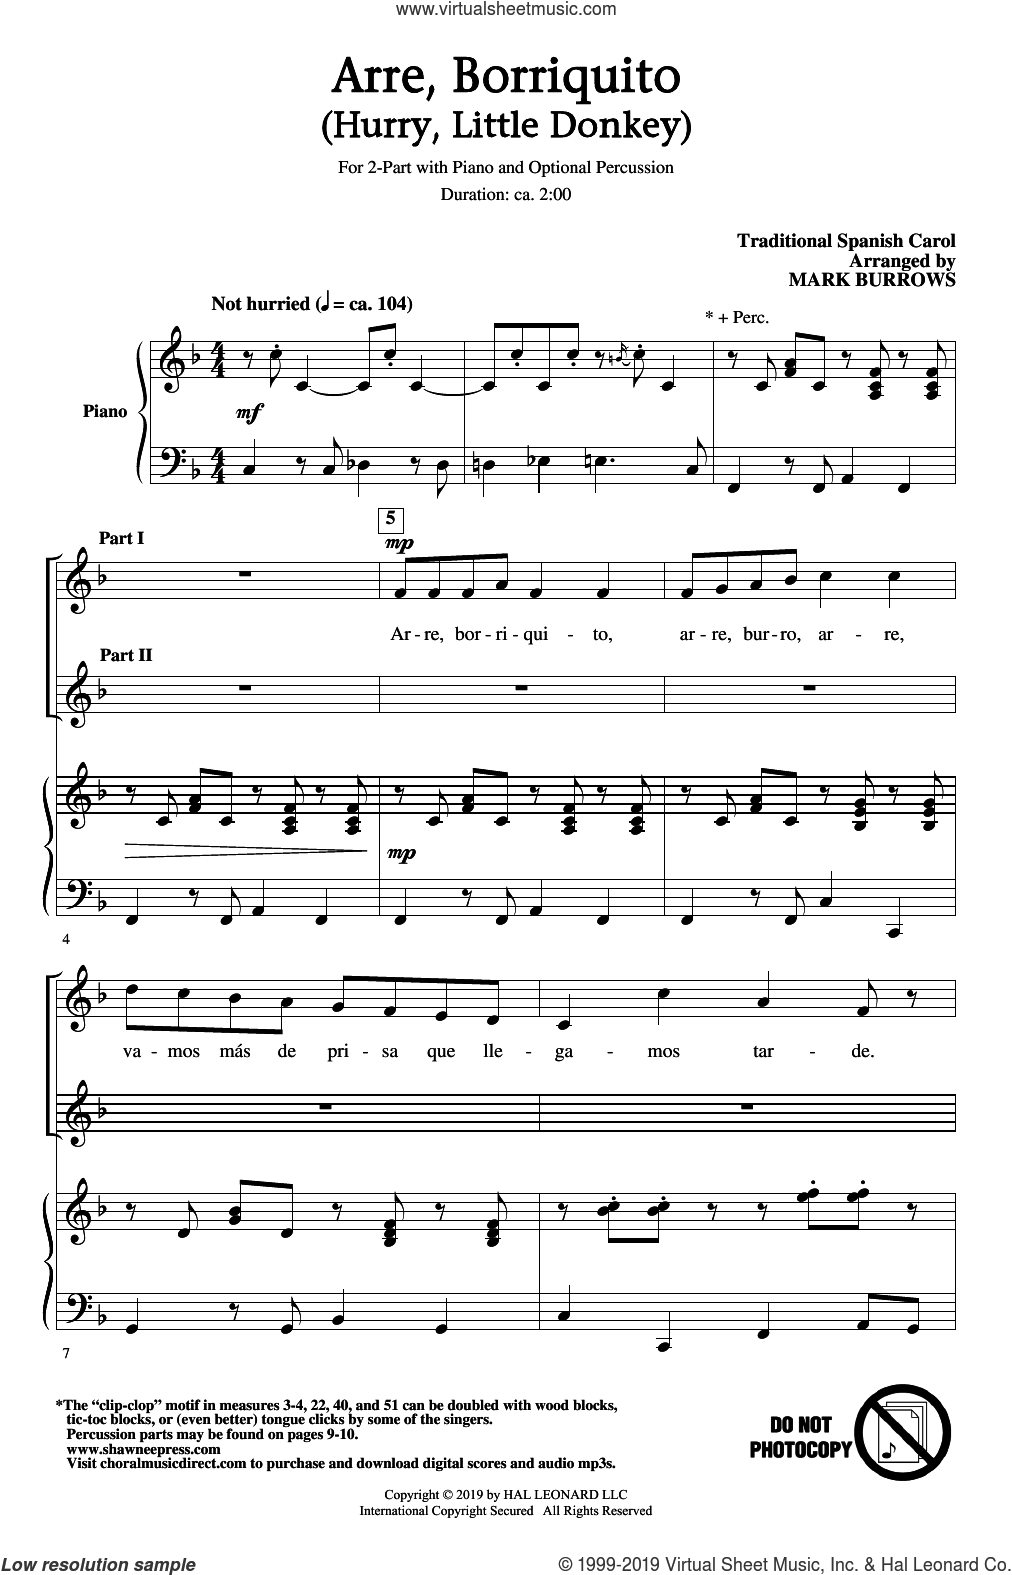 Arre Borriquito (Hurry, Little Donkey) (arr. Mark Burrows) sheet music for choir (2-Part)  and Mark Burrows, intermediate duet